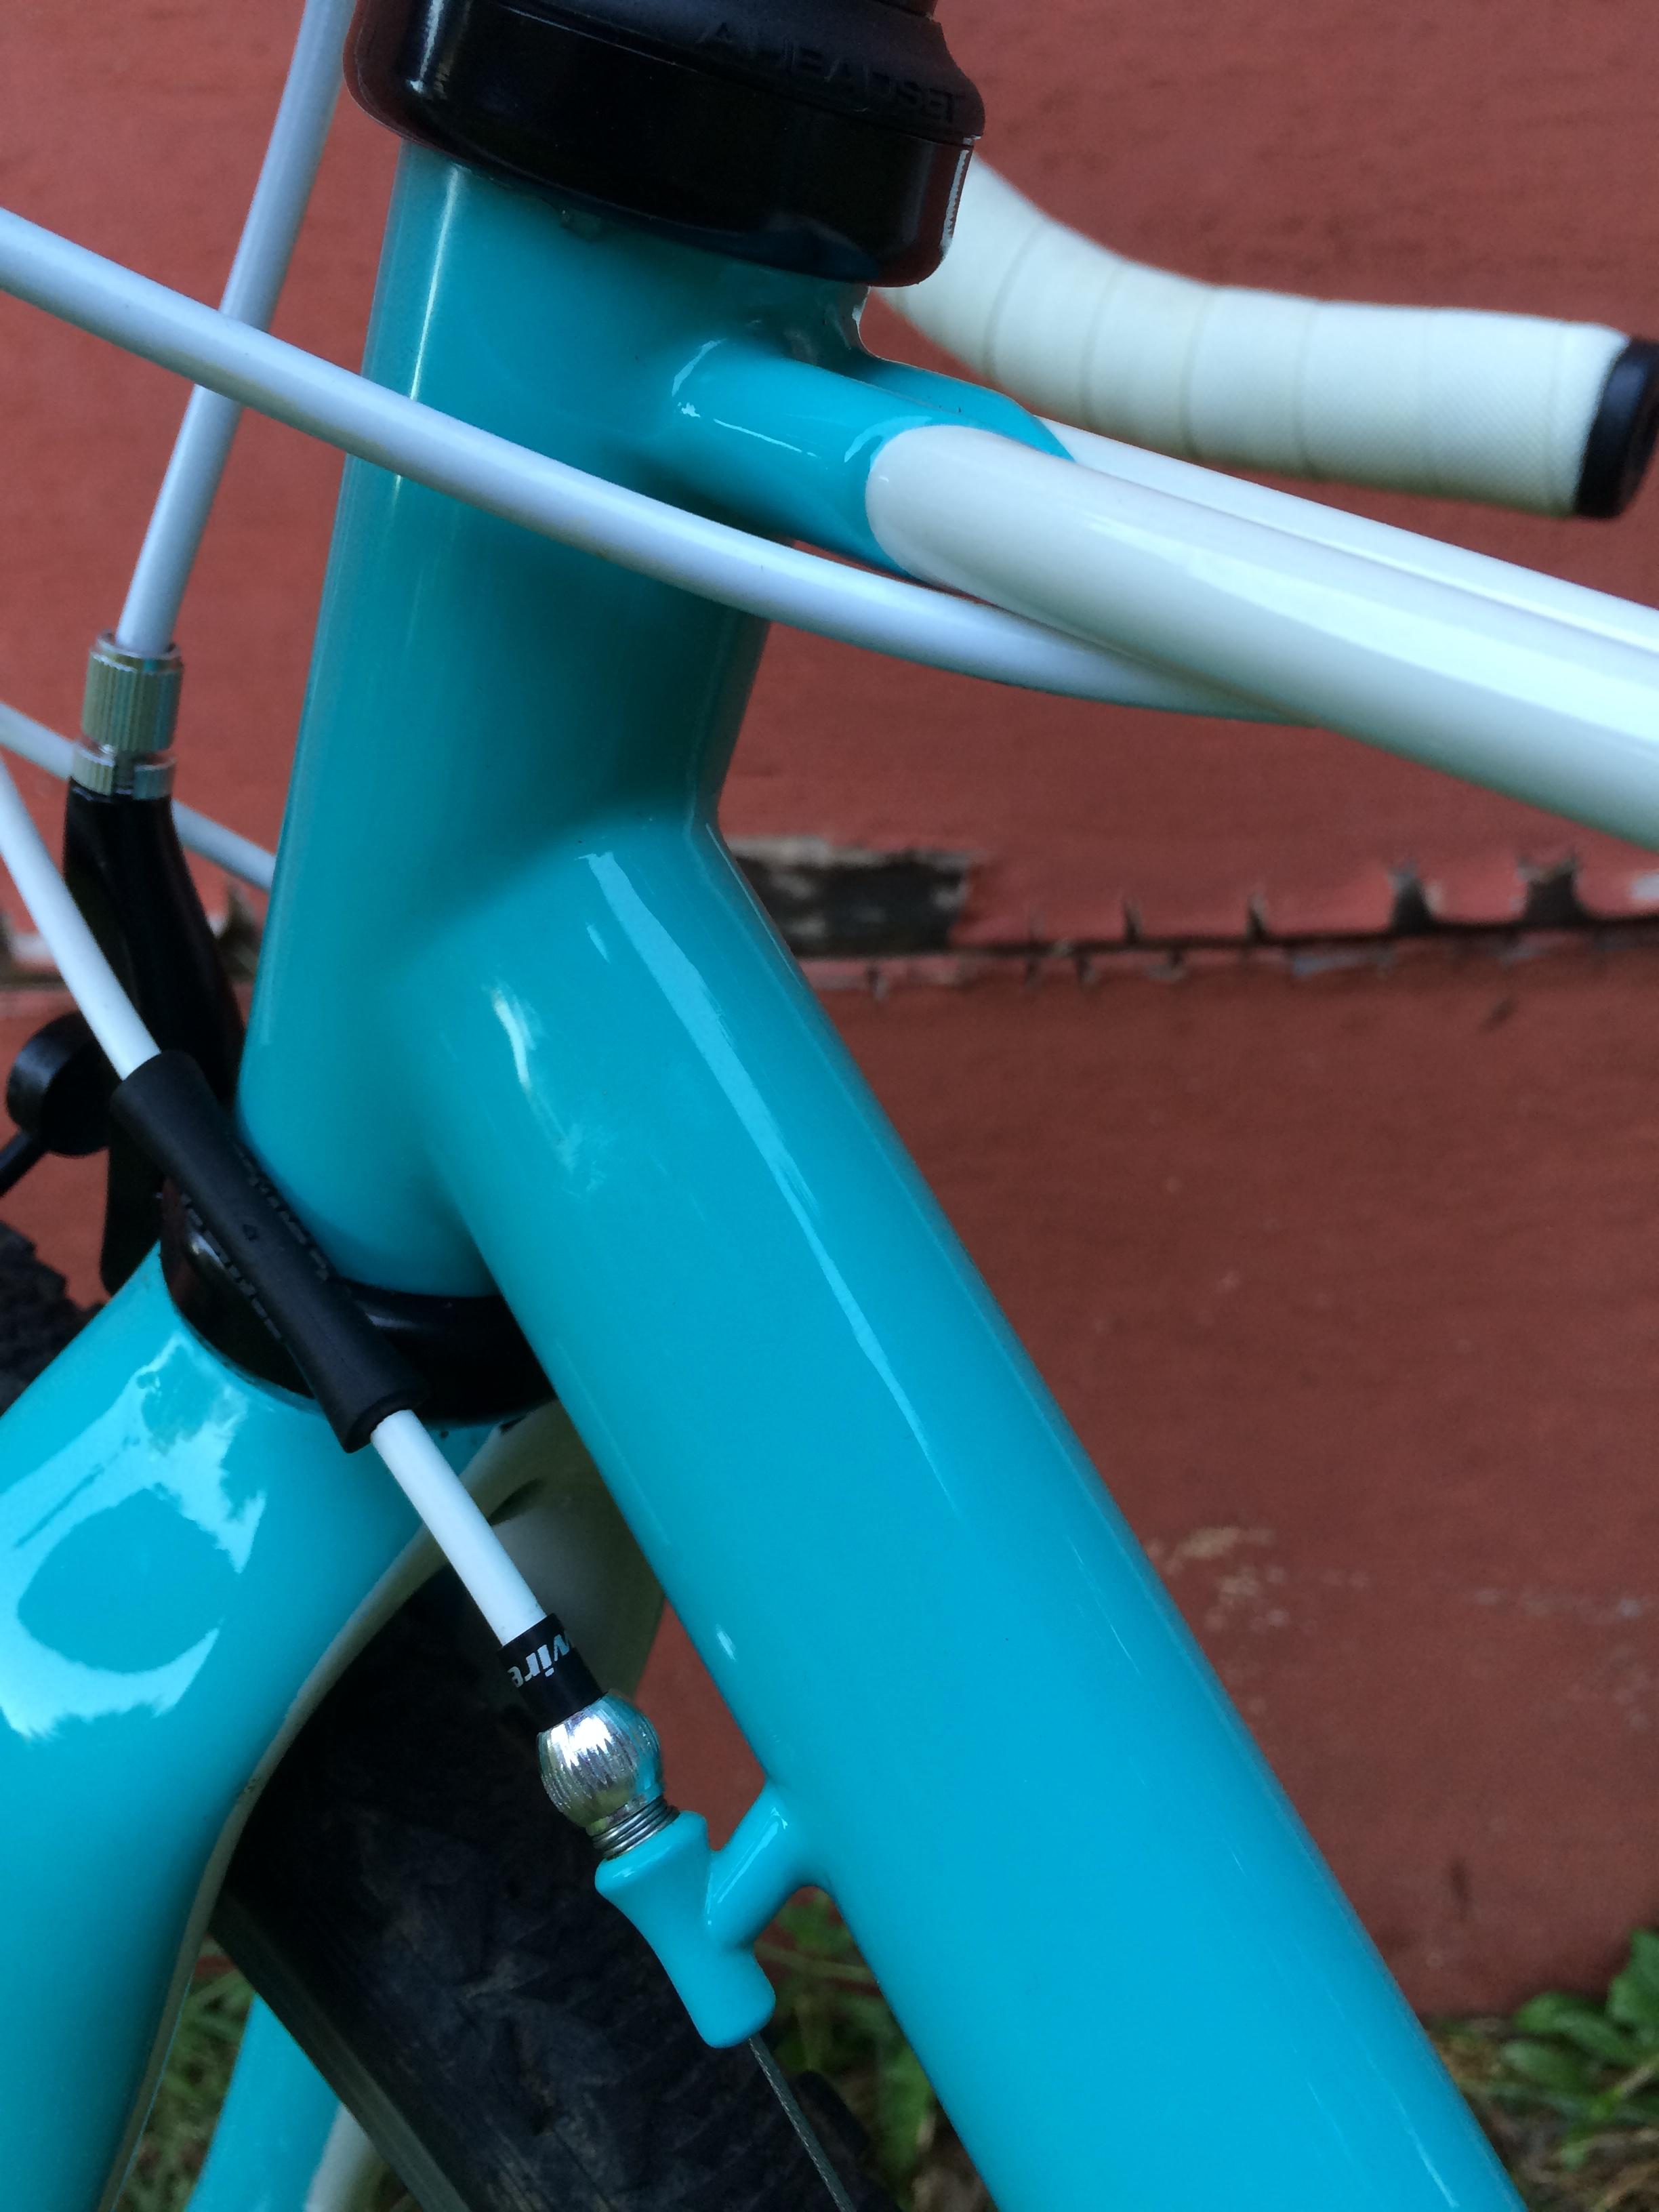 Dogwood-cycleworx-steel-custom-bicycle-columbus-tubing-cyclo-cross-14.jpg